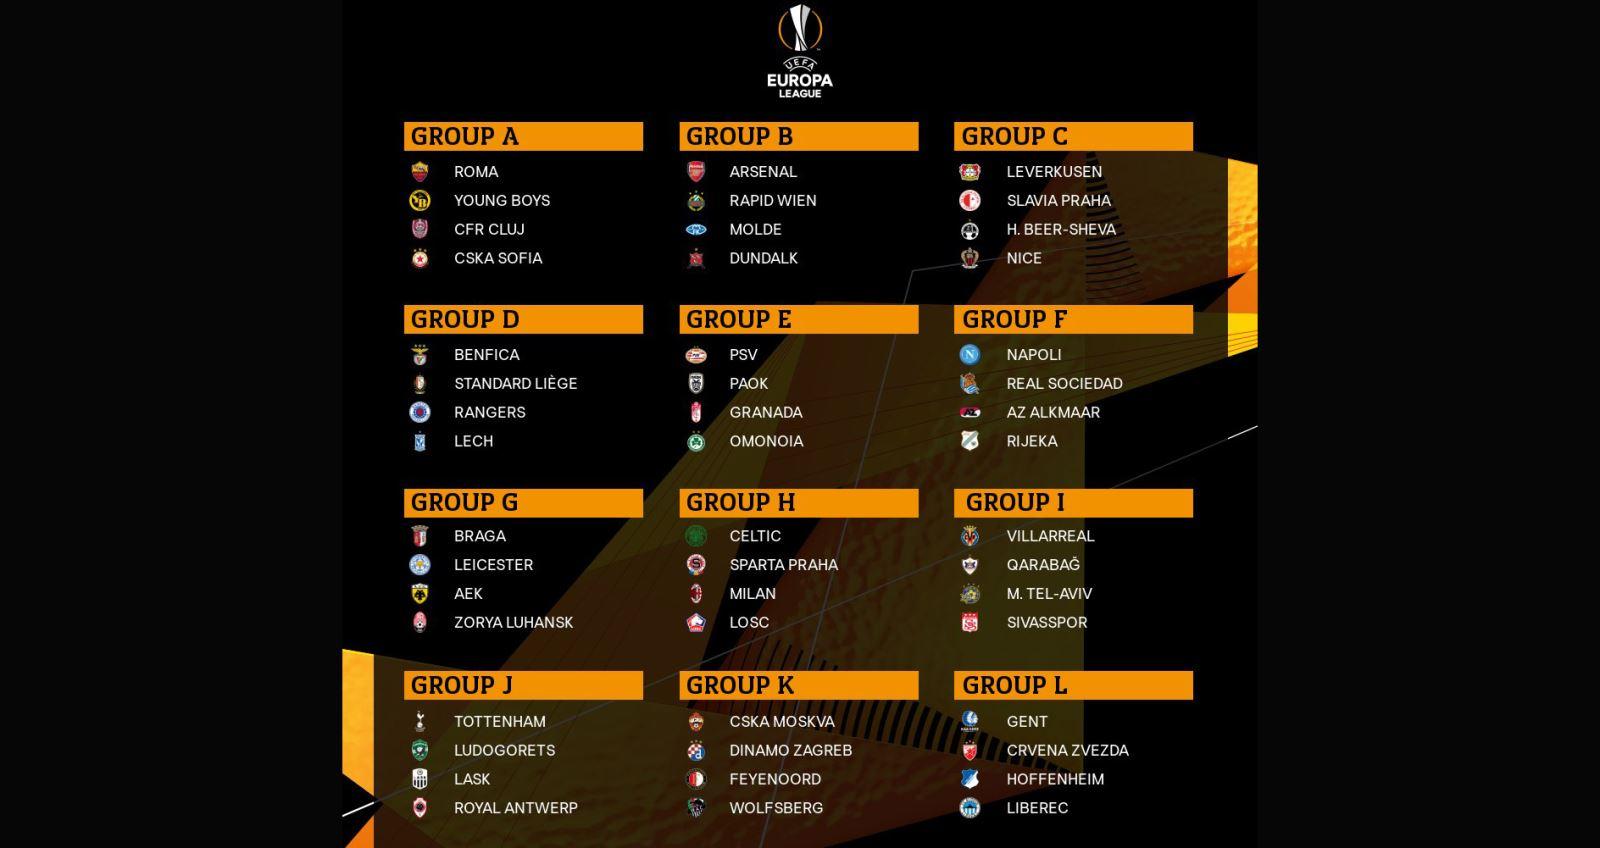 Europa League, Arsenal, Tottenham, C2, Cúp C2, bốc thăm europa league, ac milan, bốc thăm chia bảng